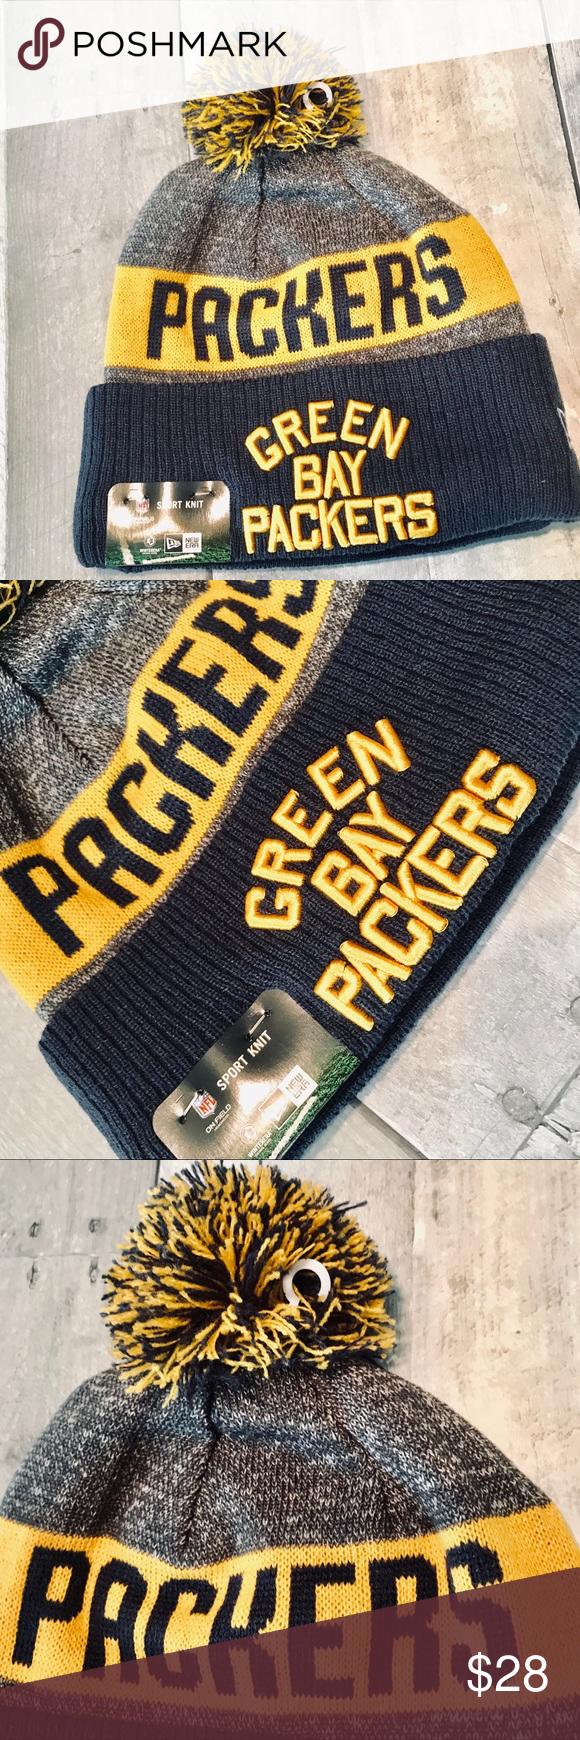 Nfl Greenbay Packers New Era Knit Winter Hat In 2020 Winter Knits Winter Hats New Era